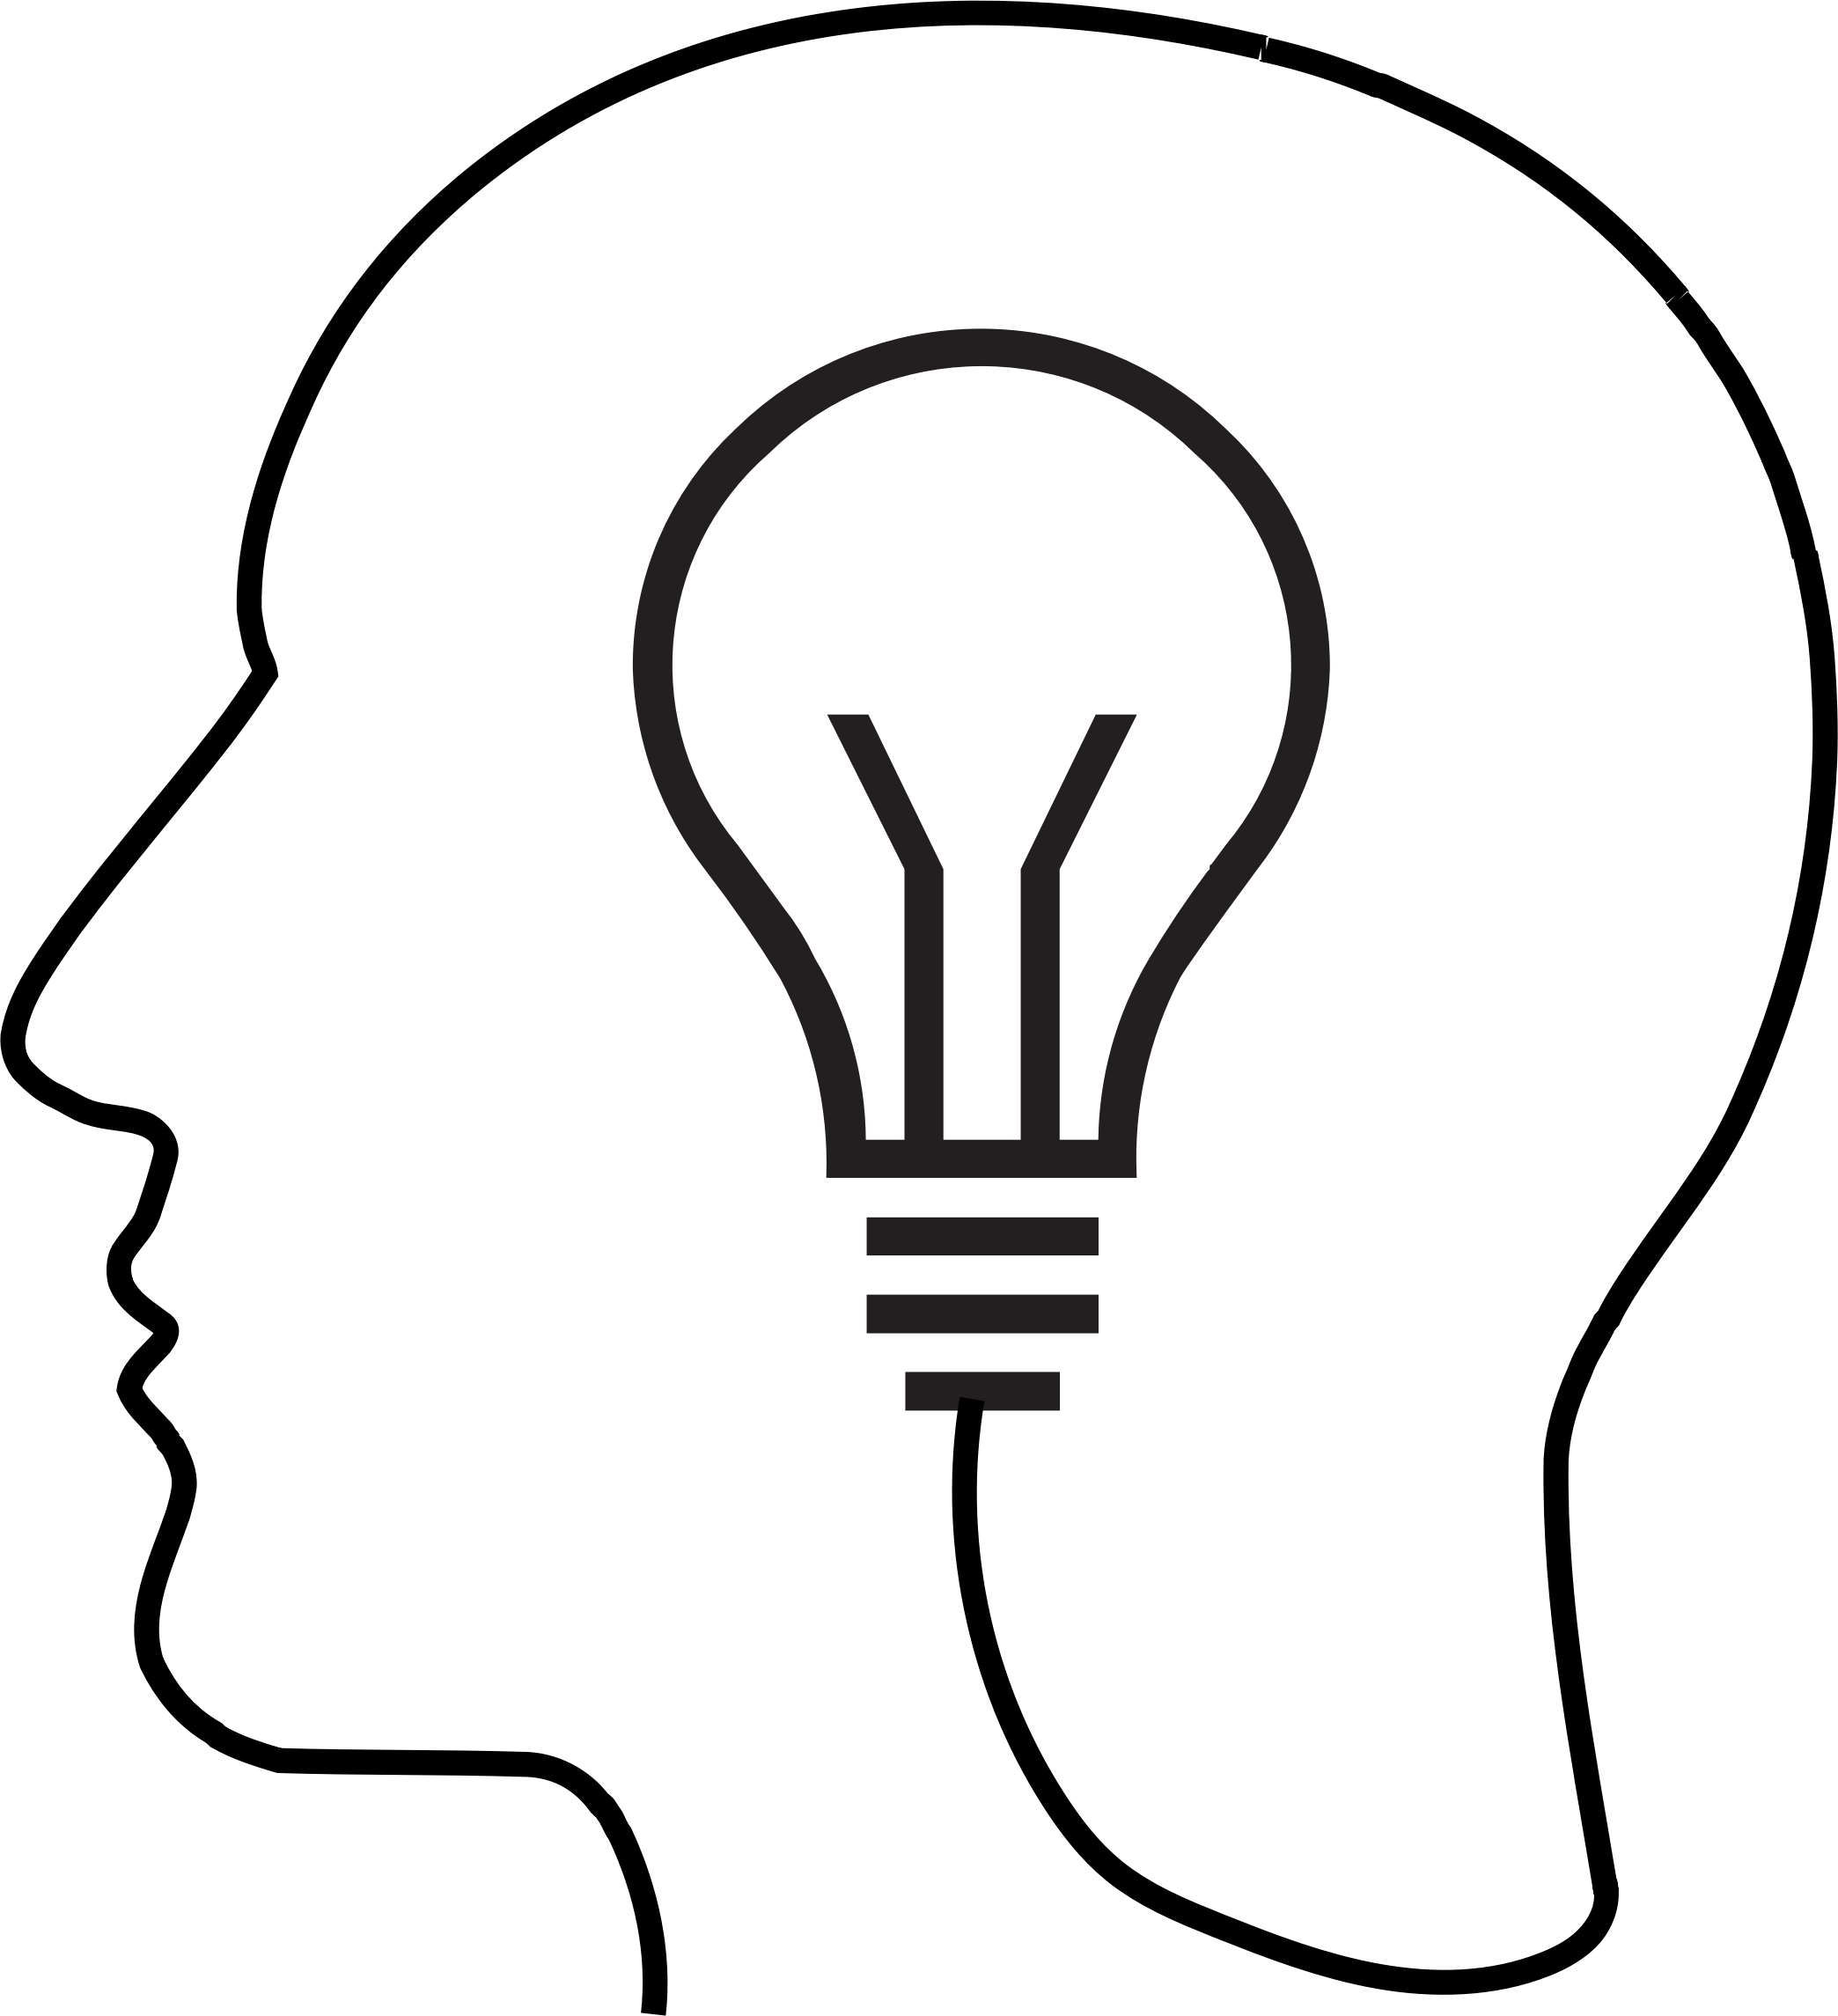 Clipart man big image. Light bulb clip art silhouette